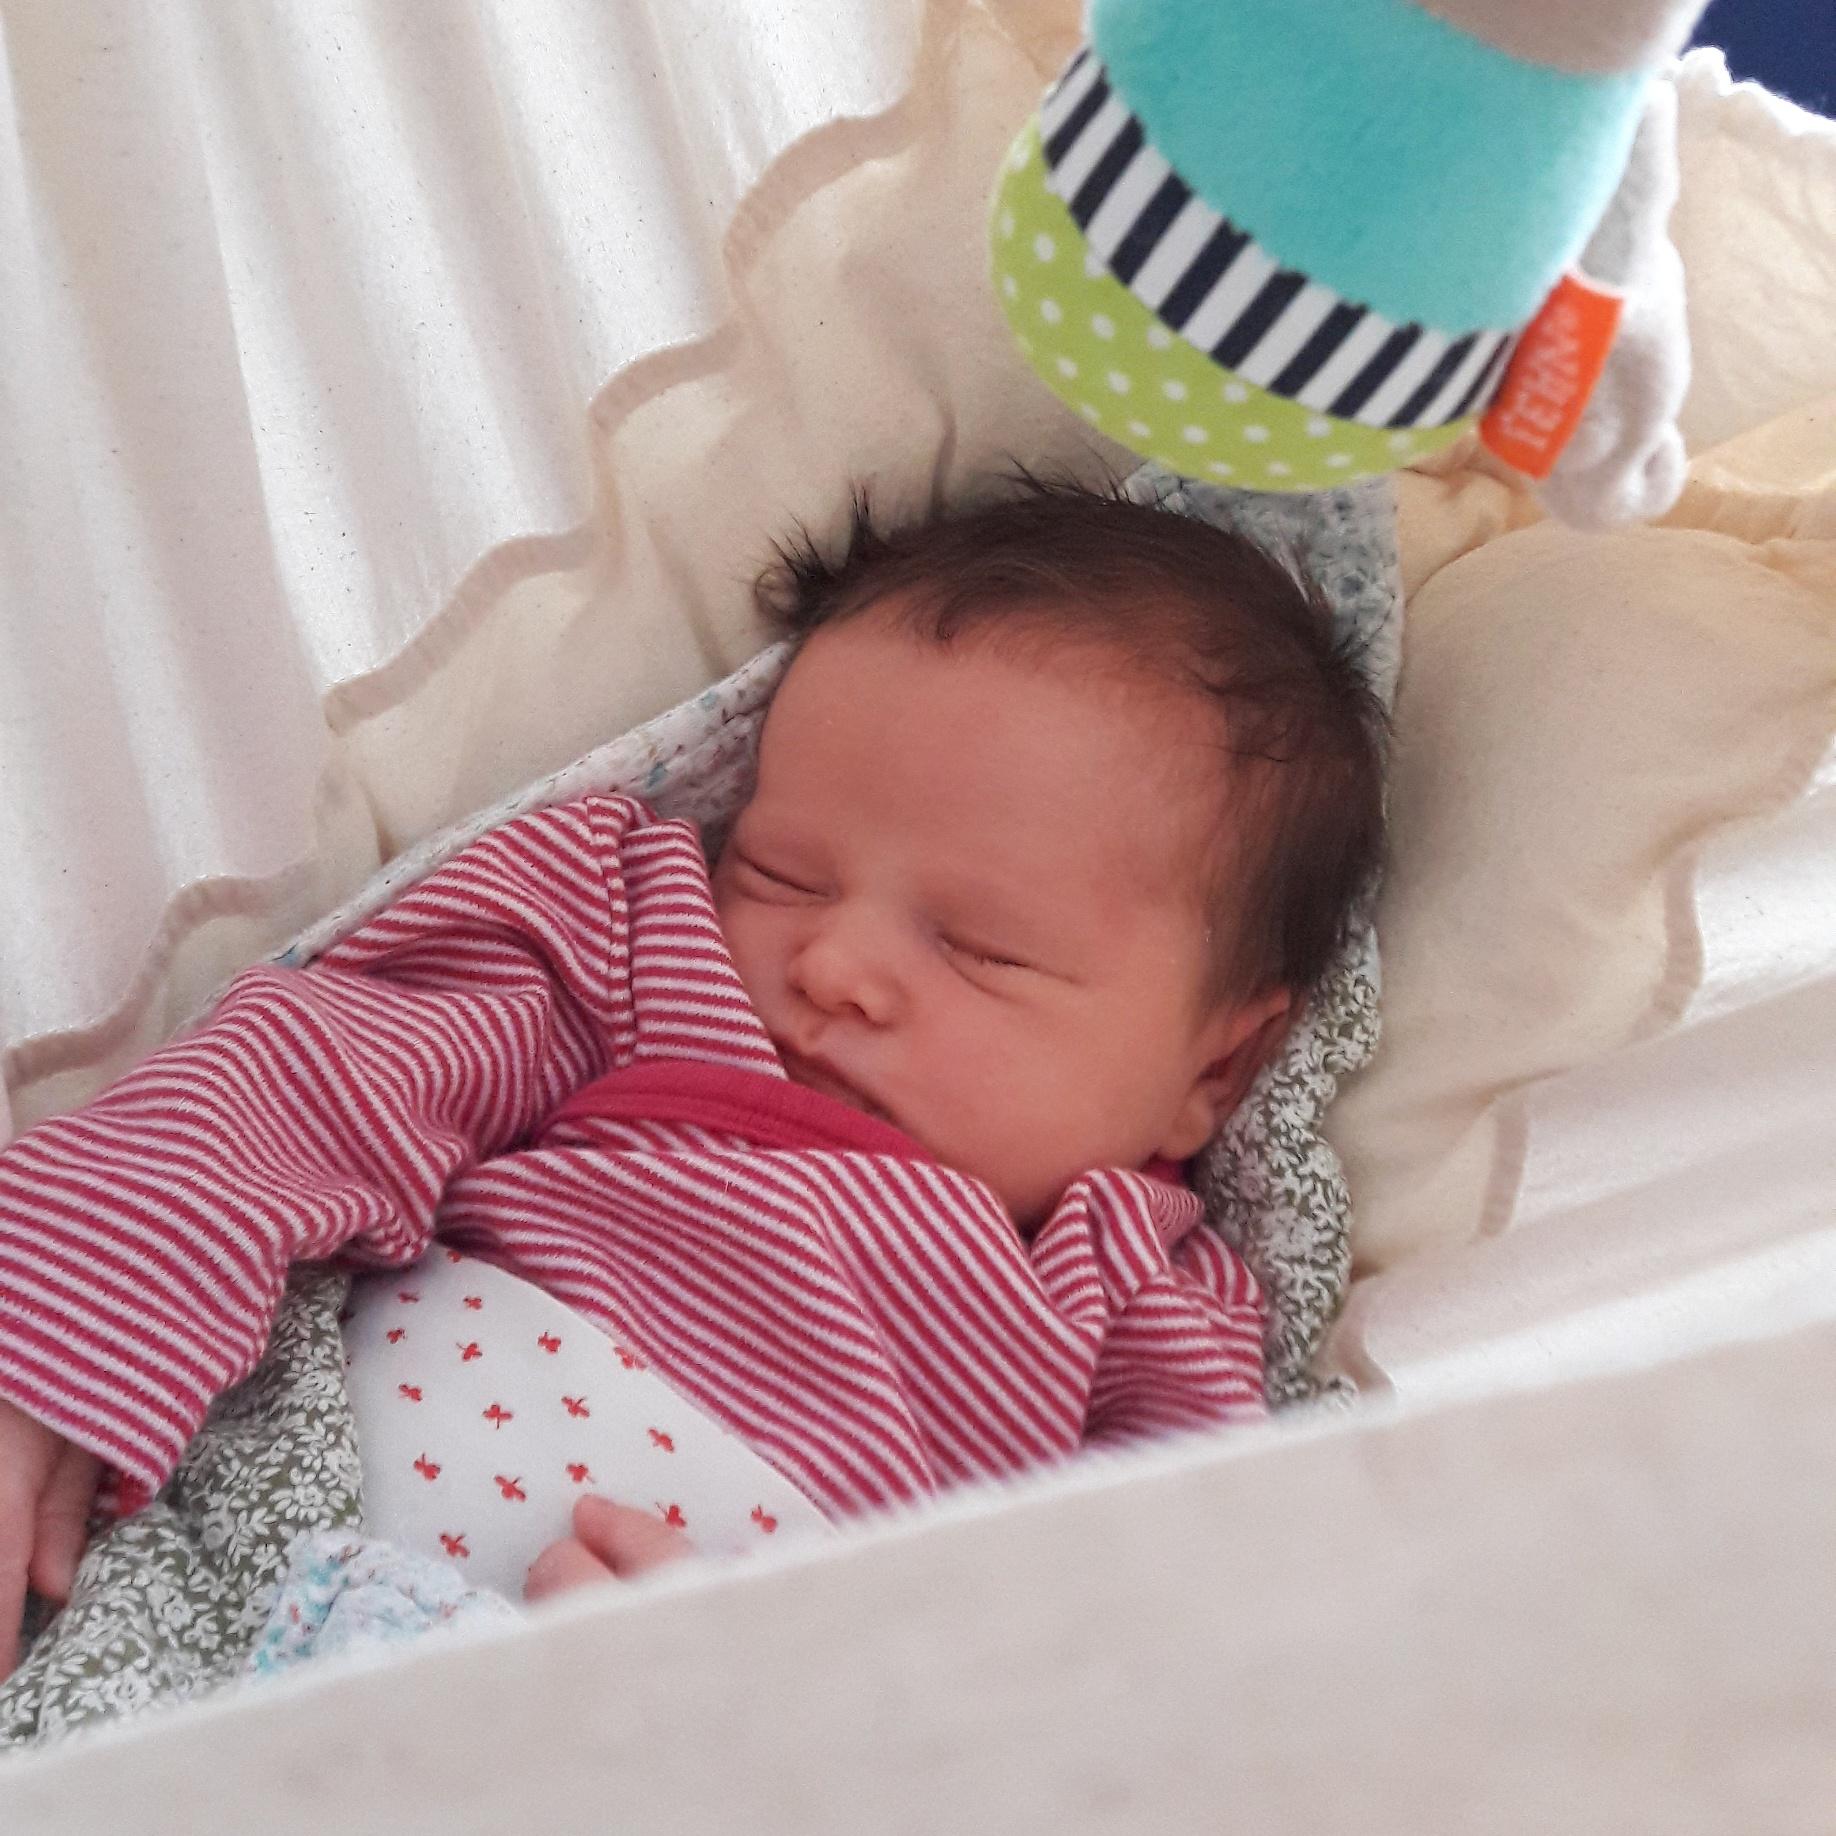 Schlafendes Baby in Federwiege